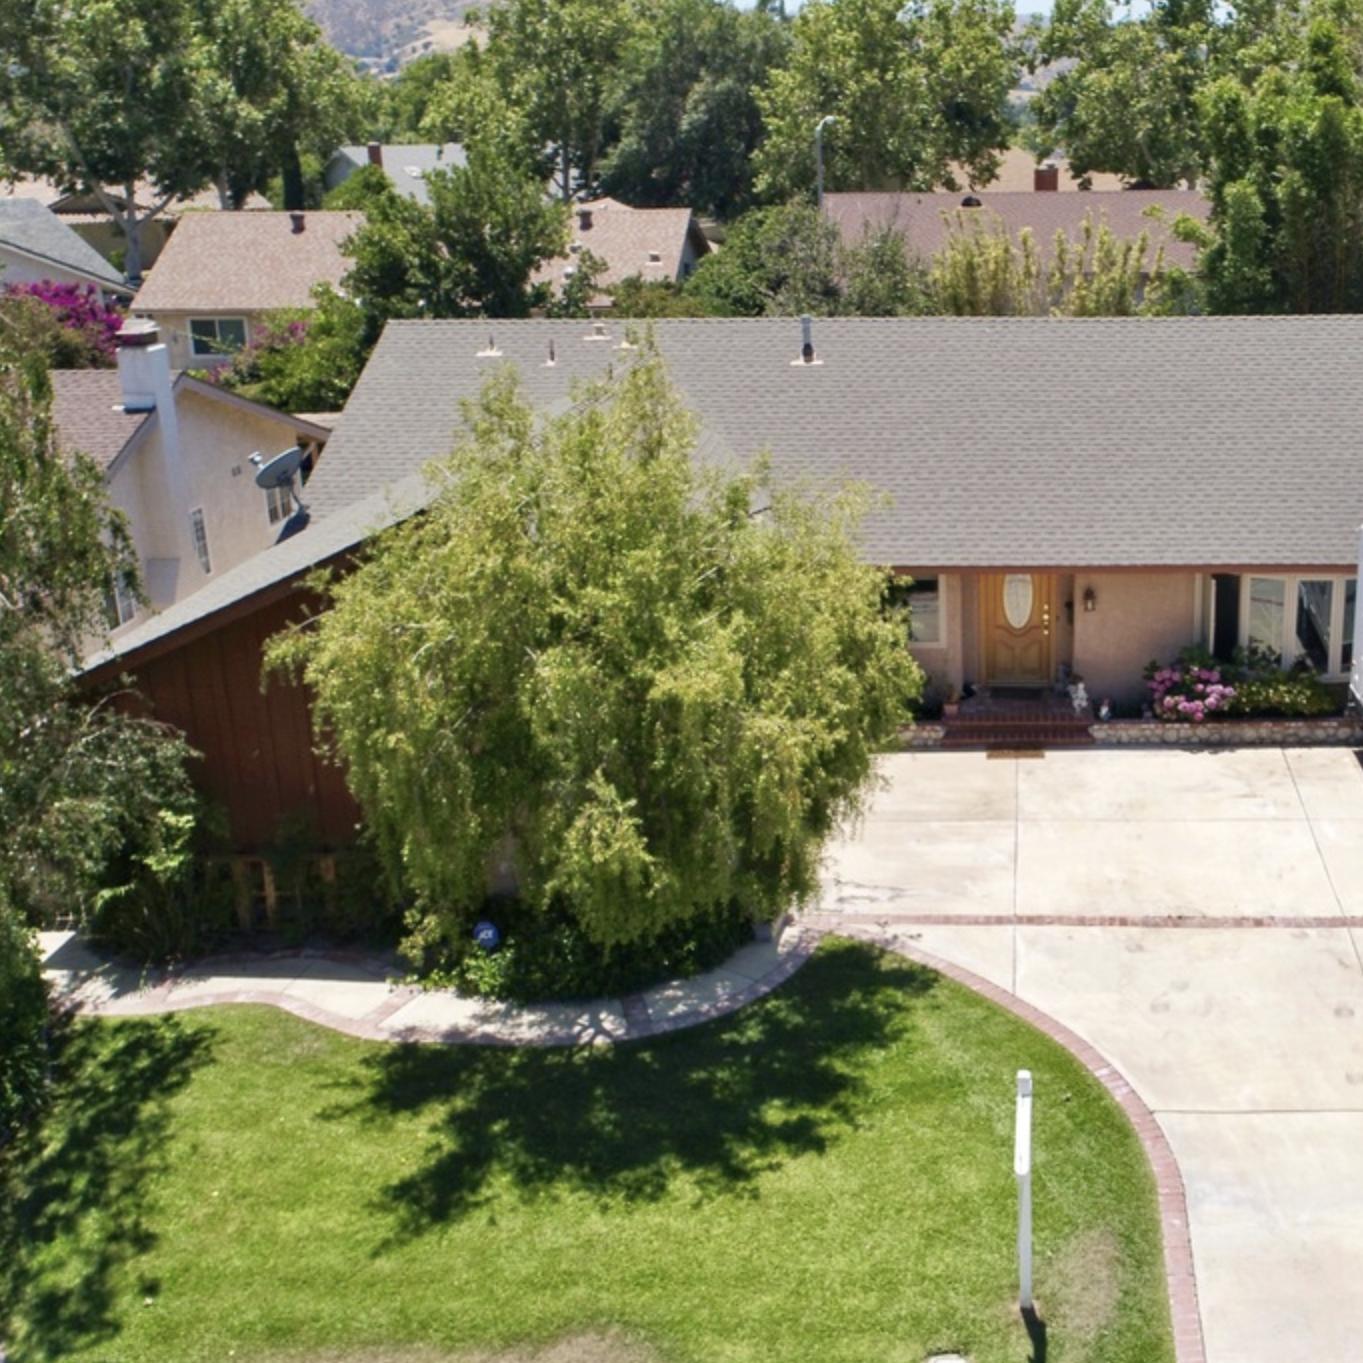 6050 Malton Ave - Simi Valley$560,000Represented Sellers